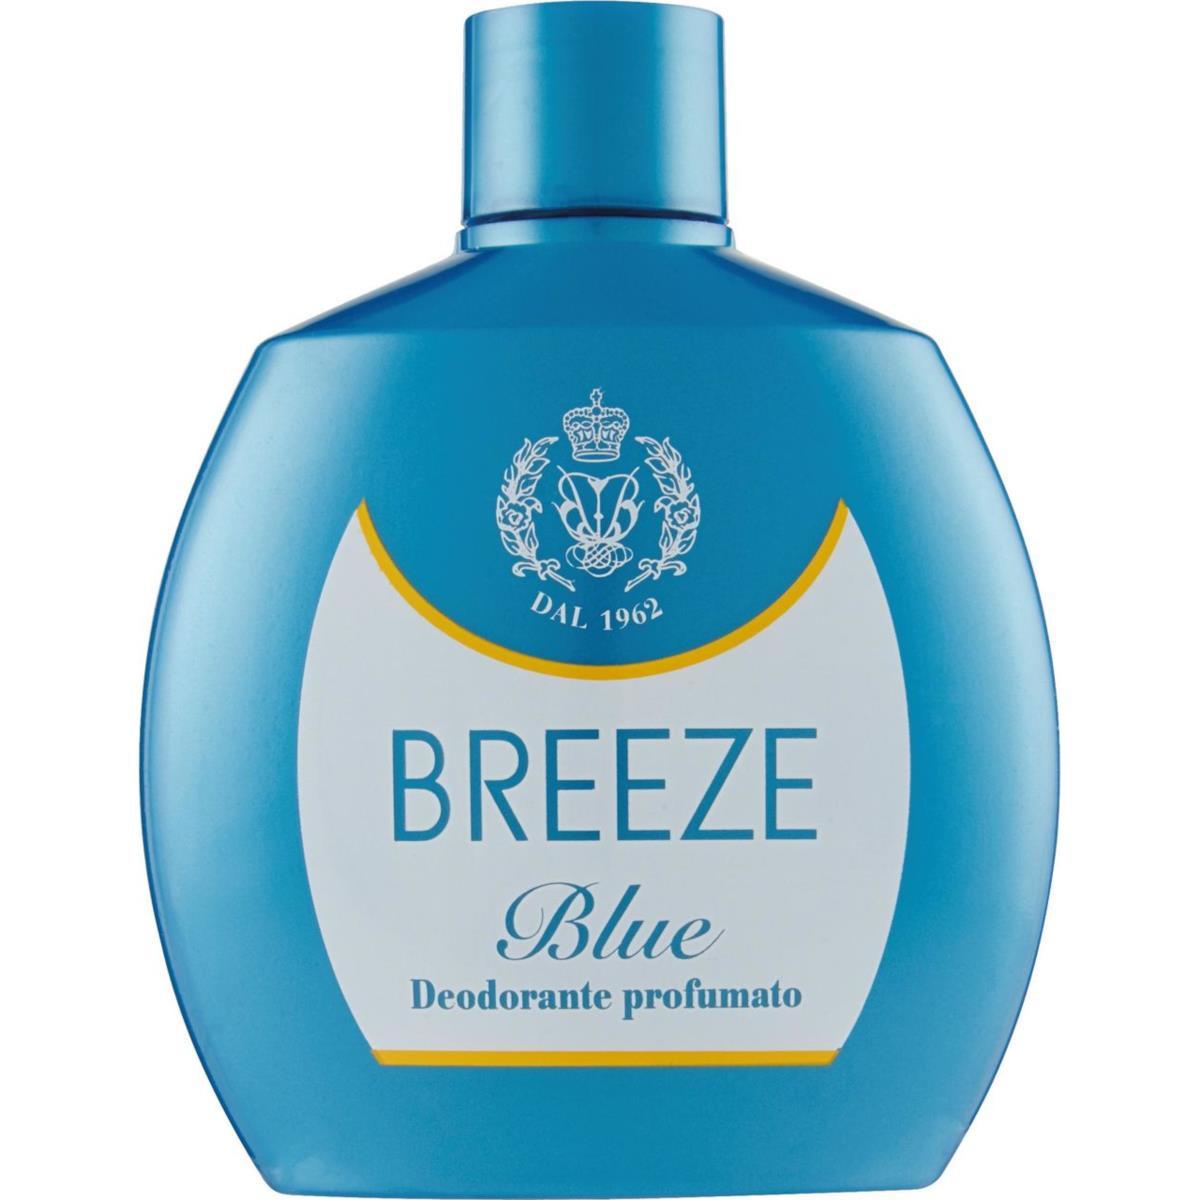 Breeze Blue Deodorante Profumato 100ml